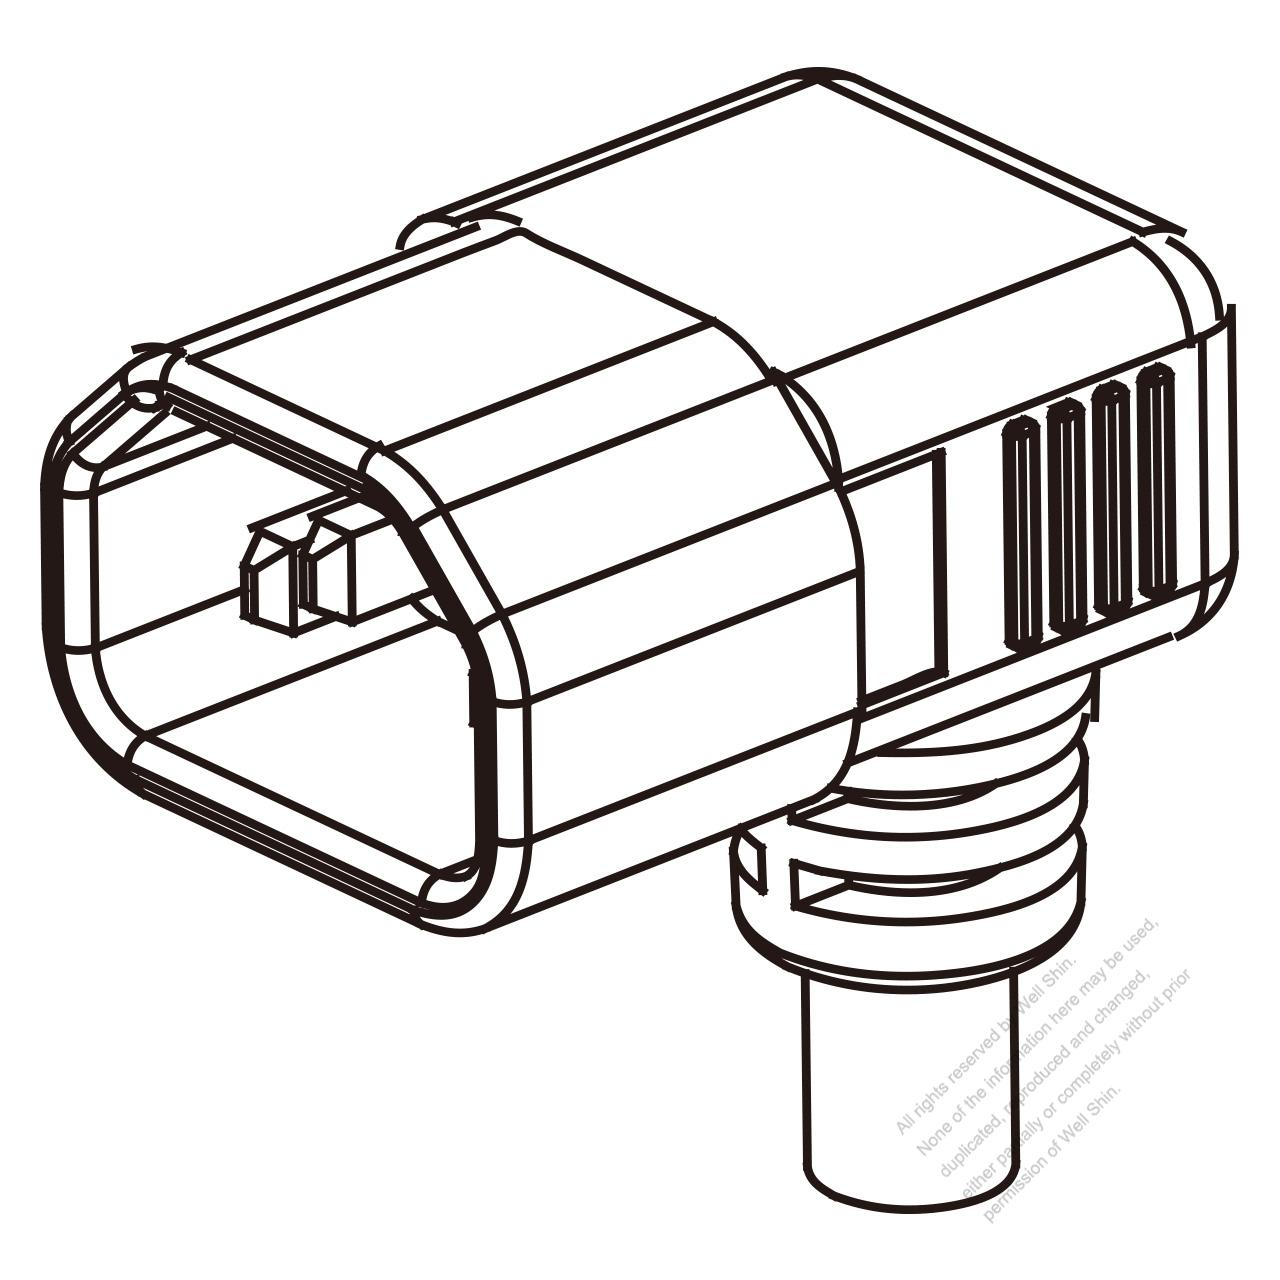 Uk Iec 320 Sheet E C14 Plug Connectors 3 Pin Angle 10a